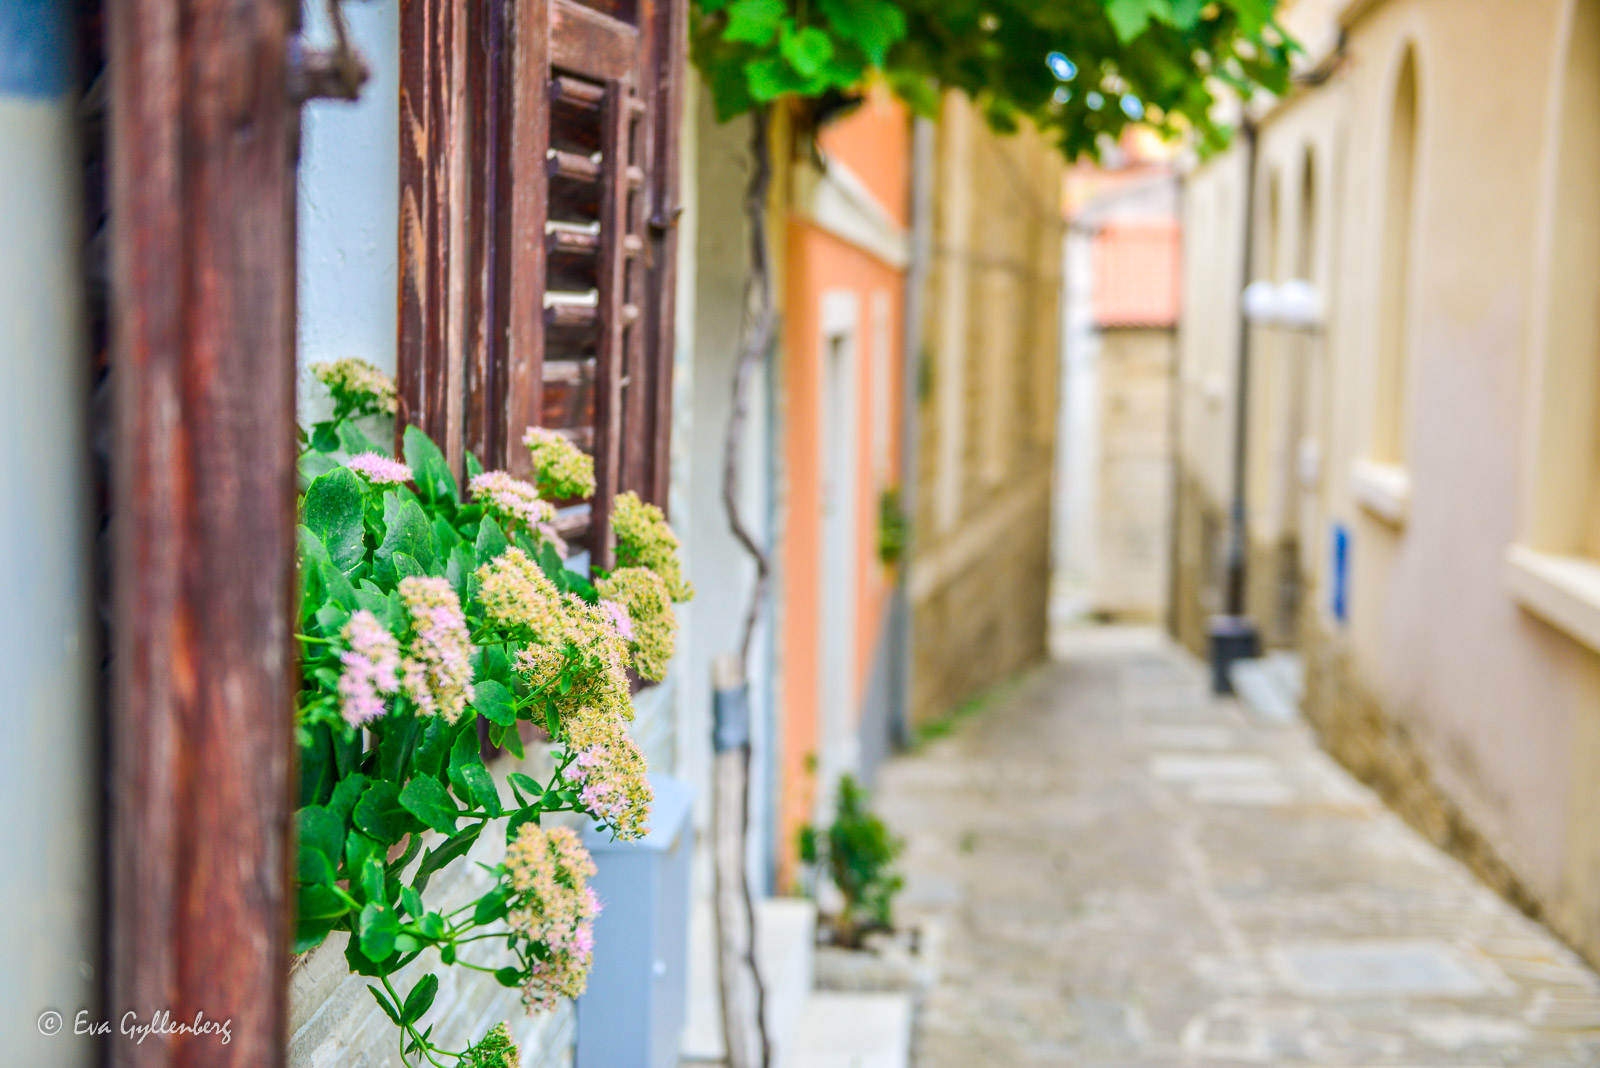 Gata i Pirans gamla stad